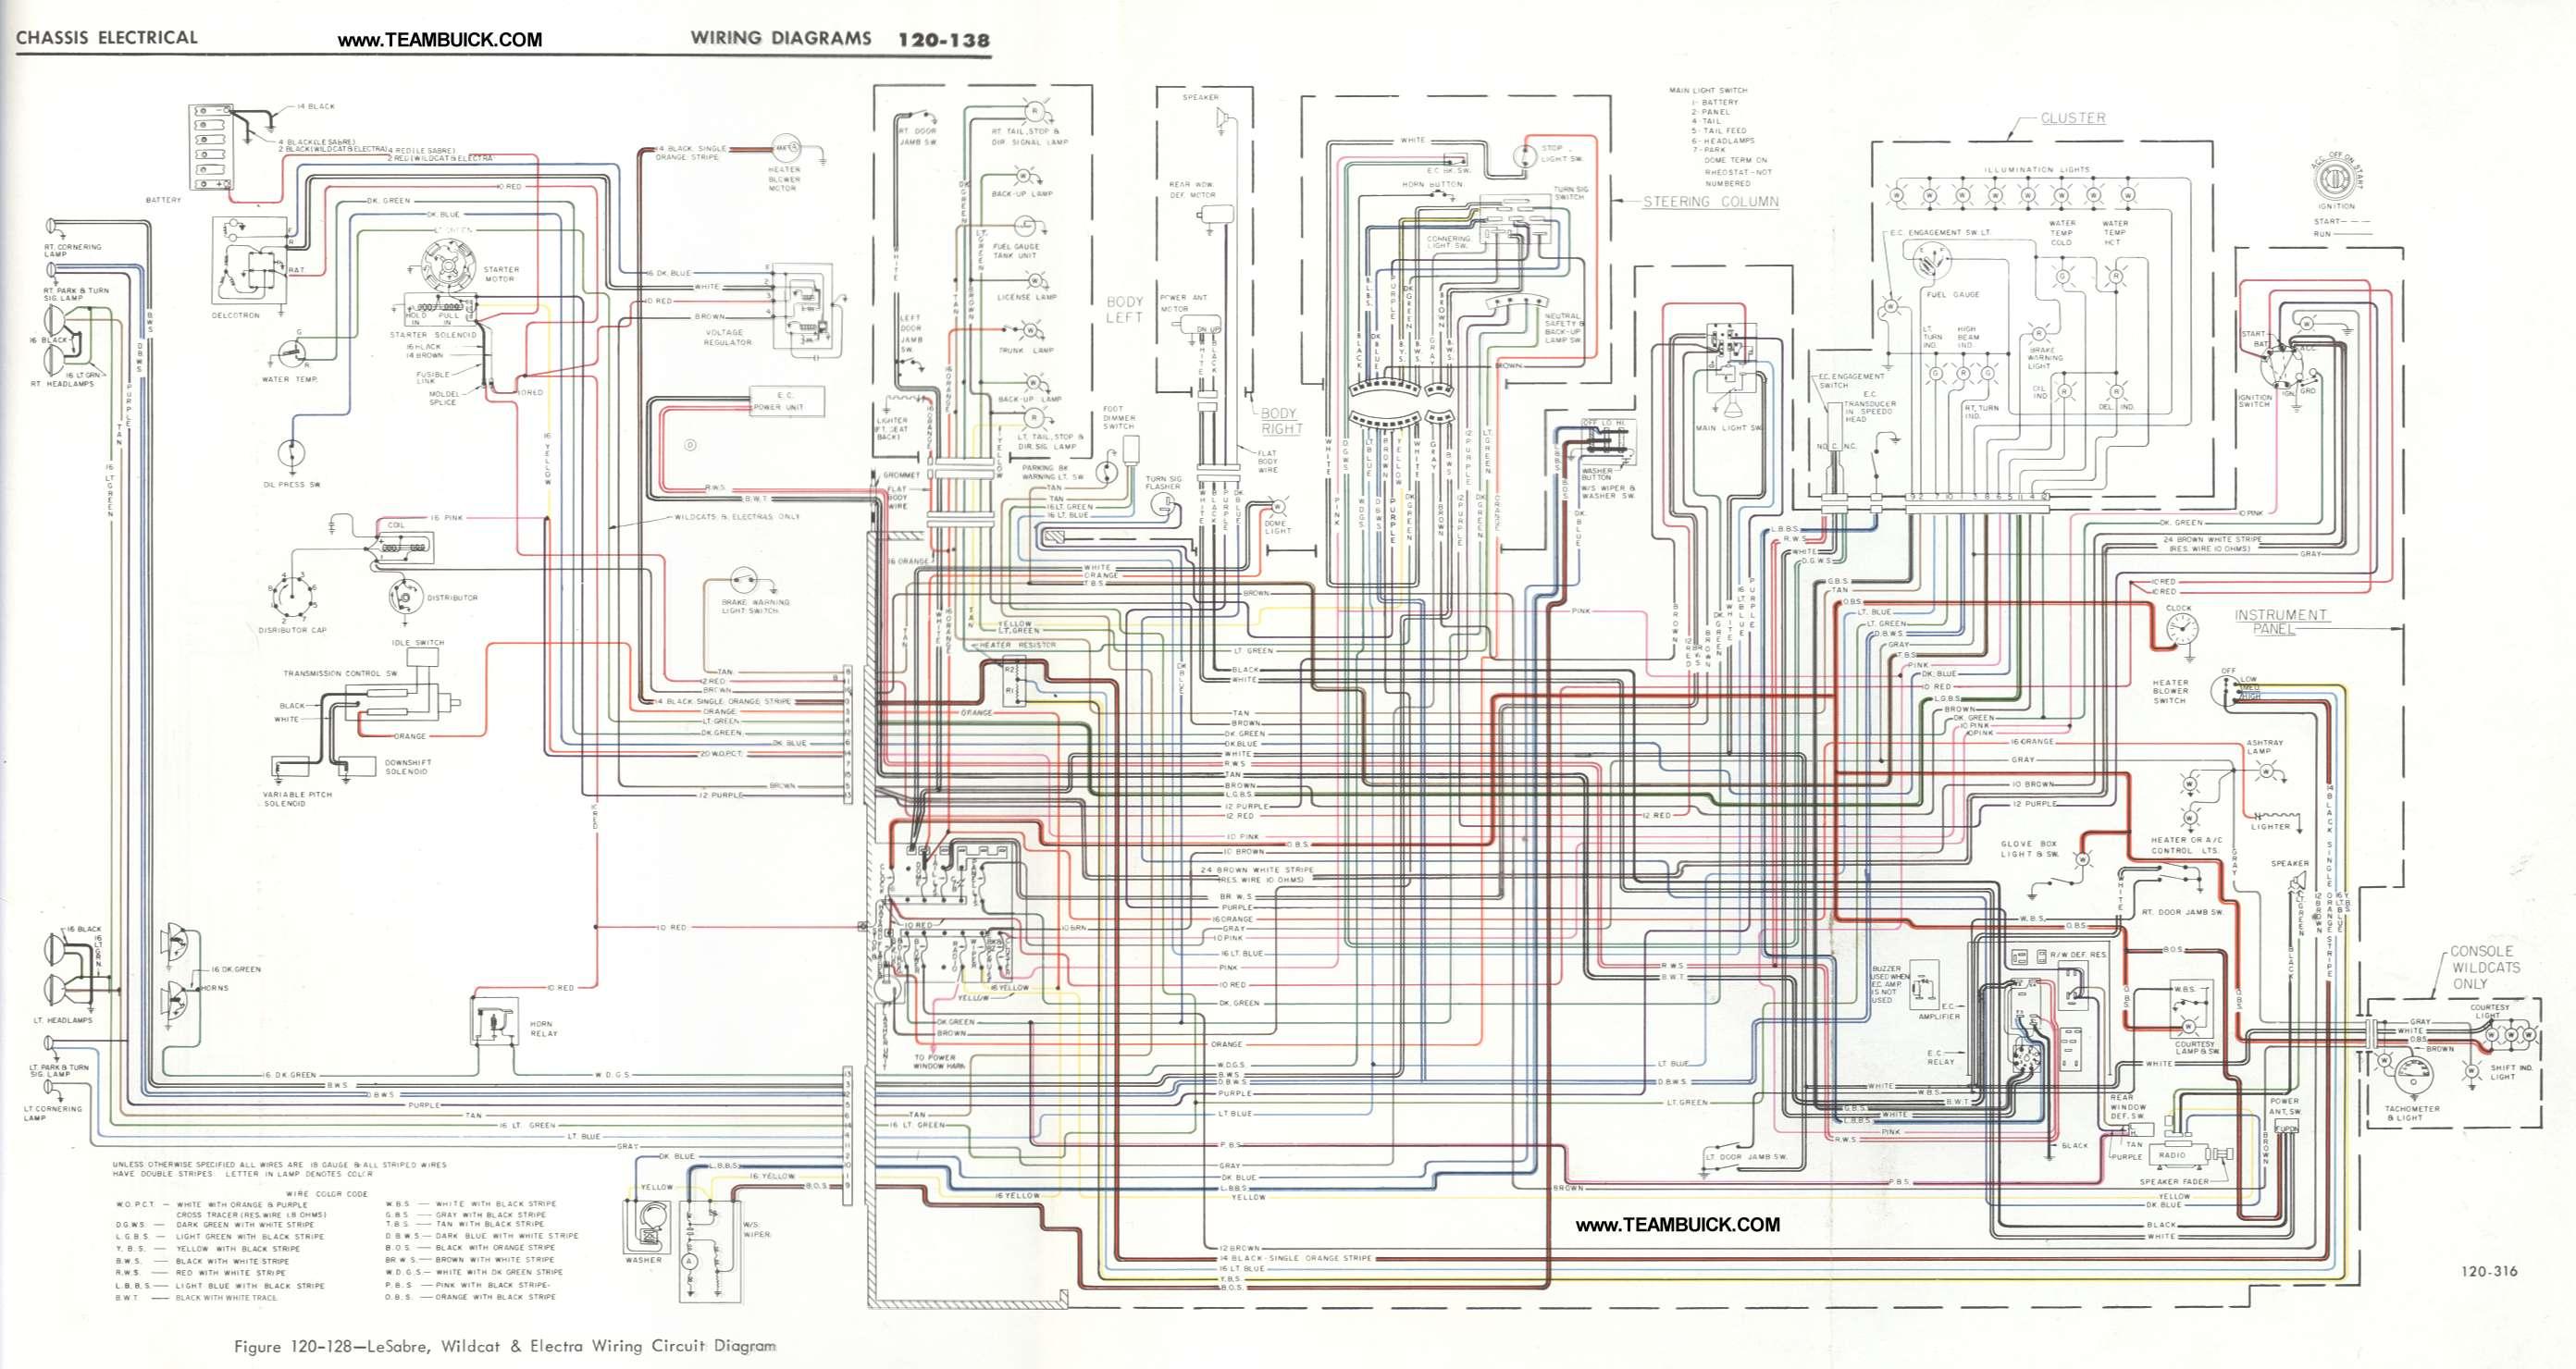 Buick Lesabre Wildcat Electra Wiring Diagram